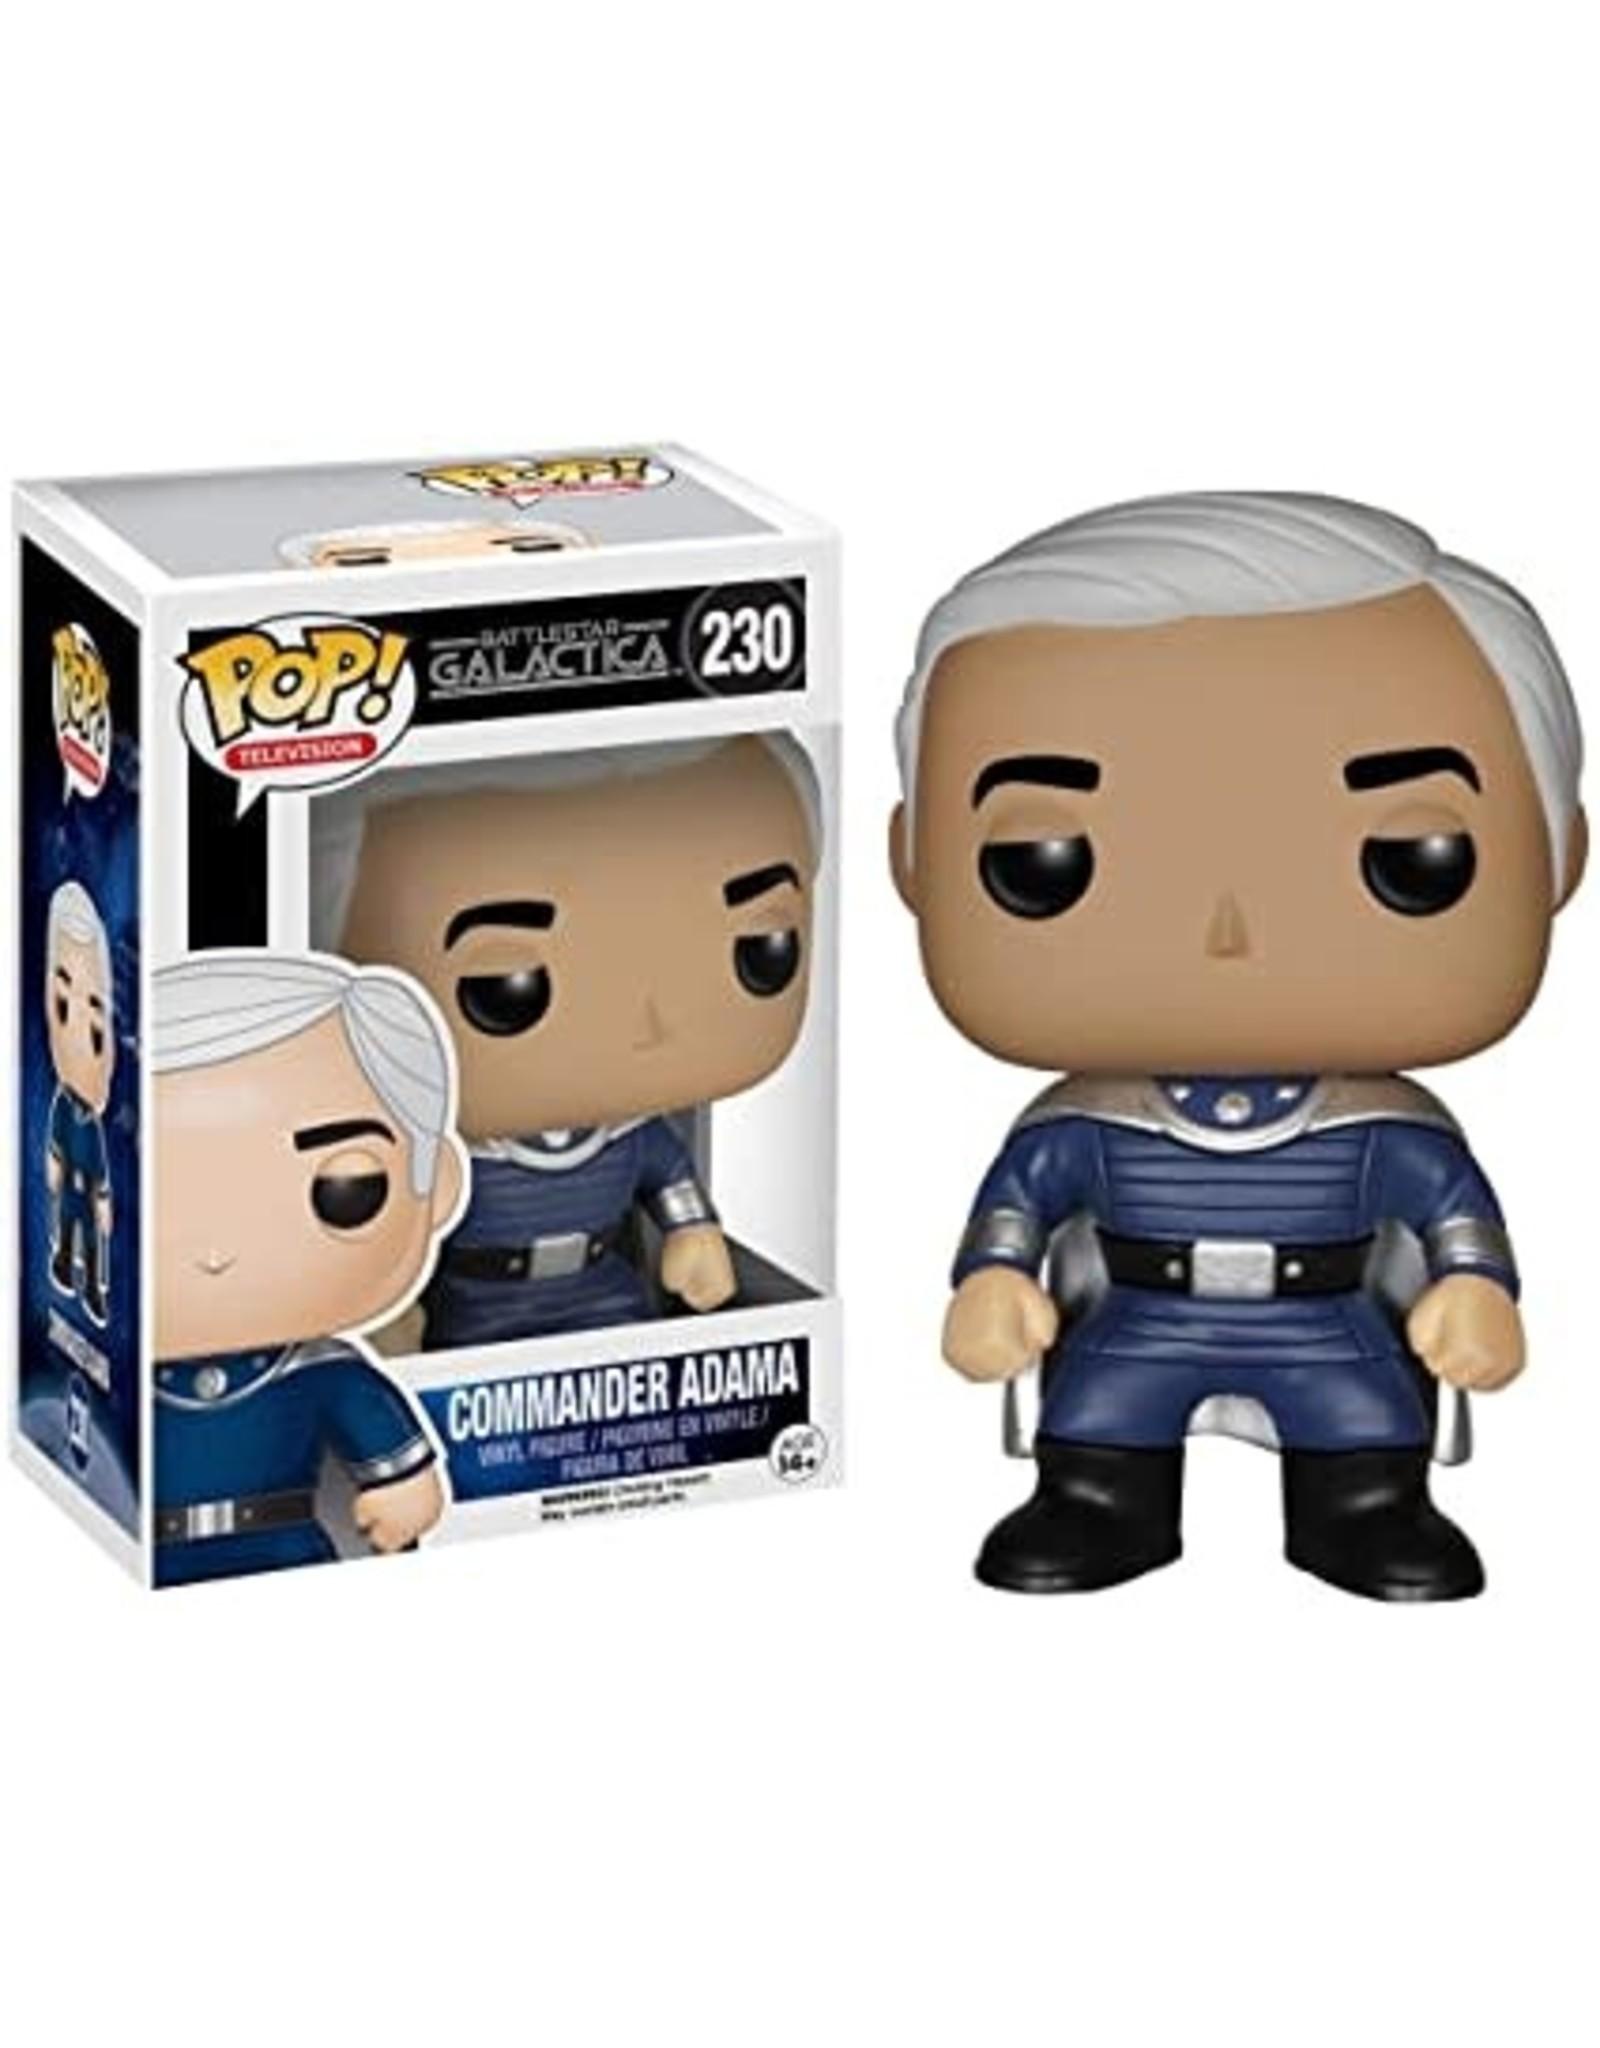 Battlestar Galactica POP Commander Adama